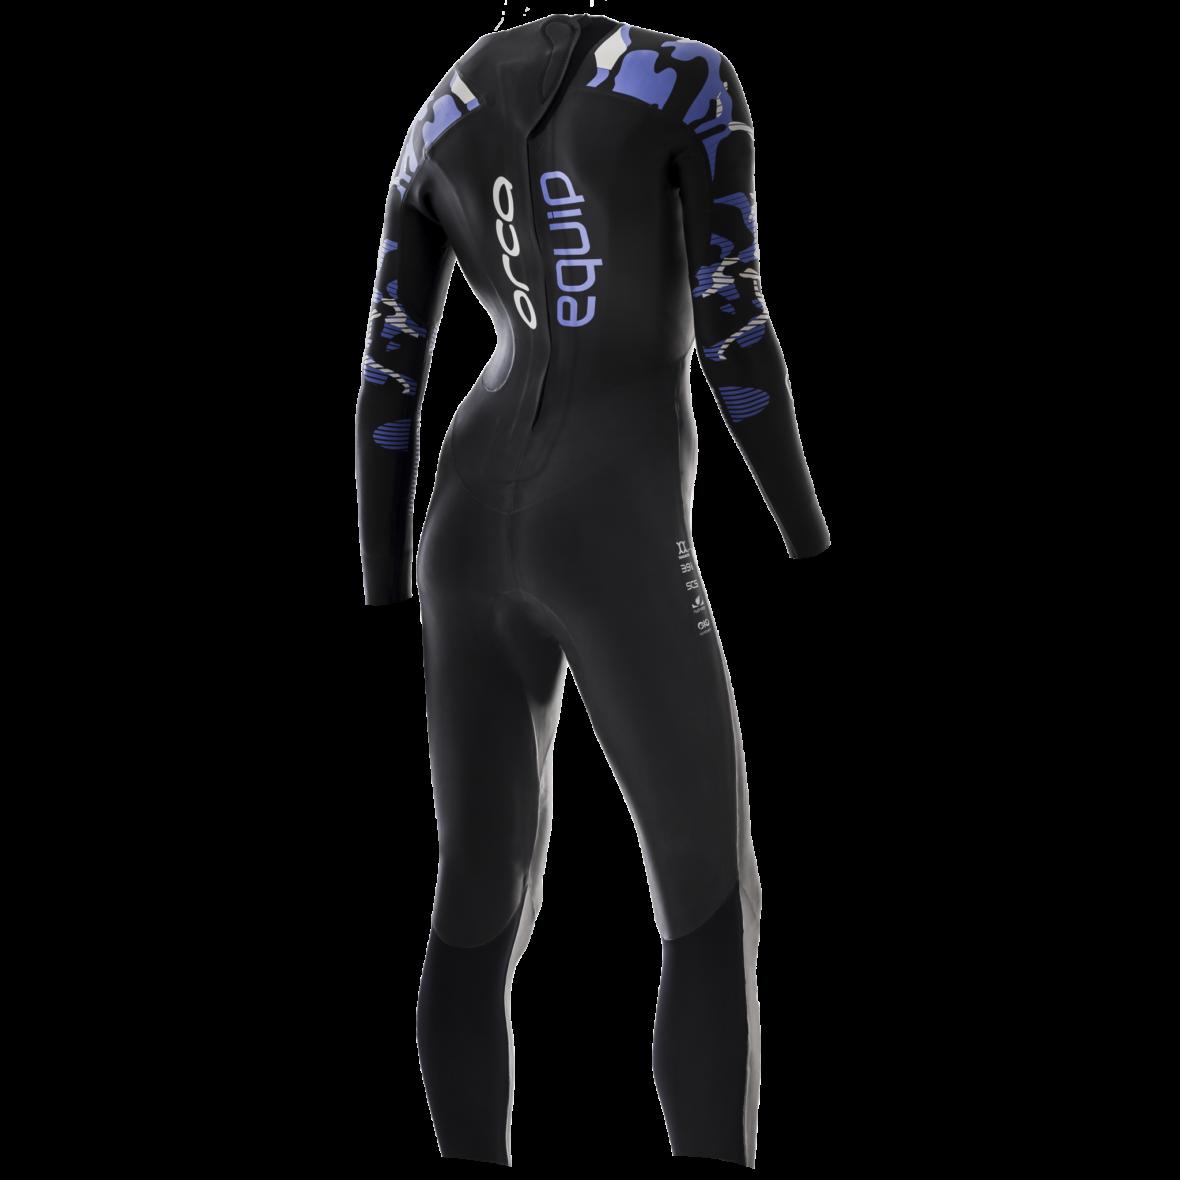 Orca Women S Equip Triathlon Wetsuit Justwetsuits Com